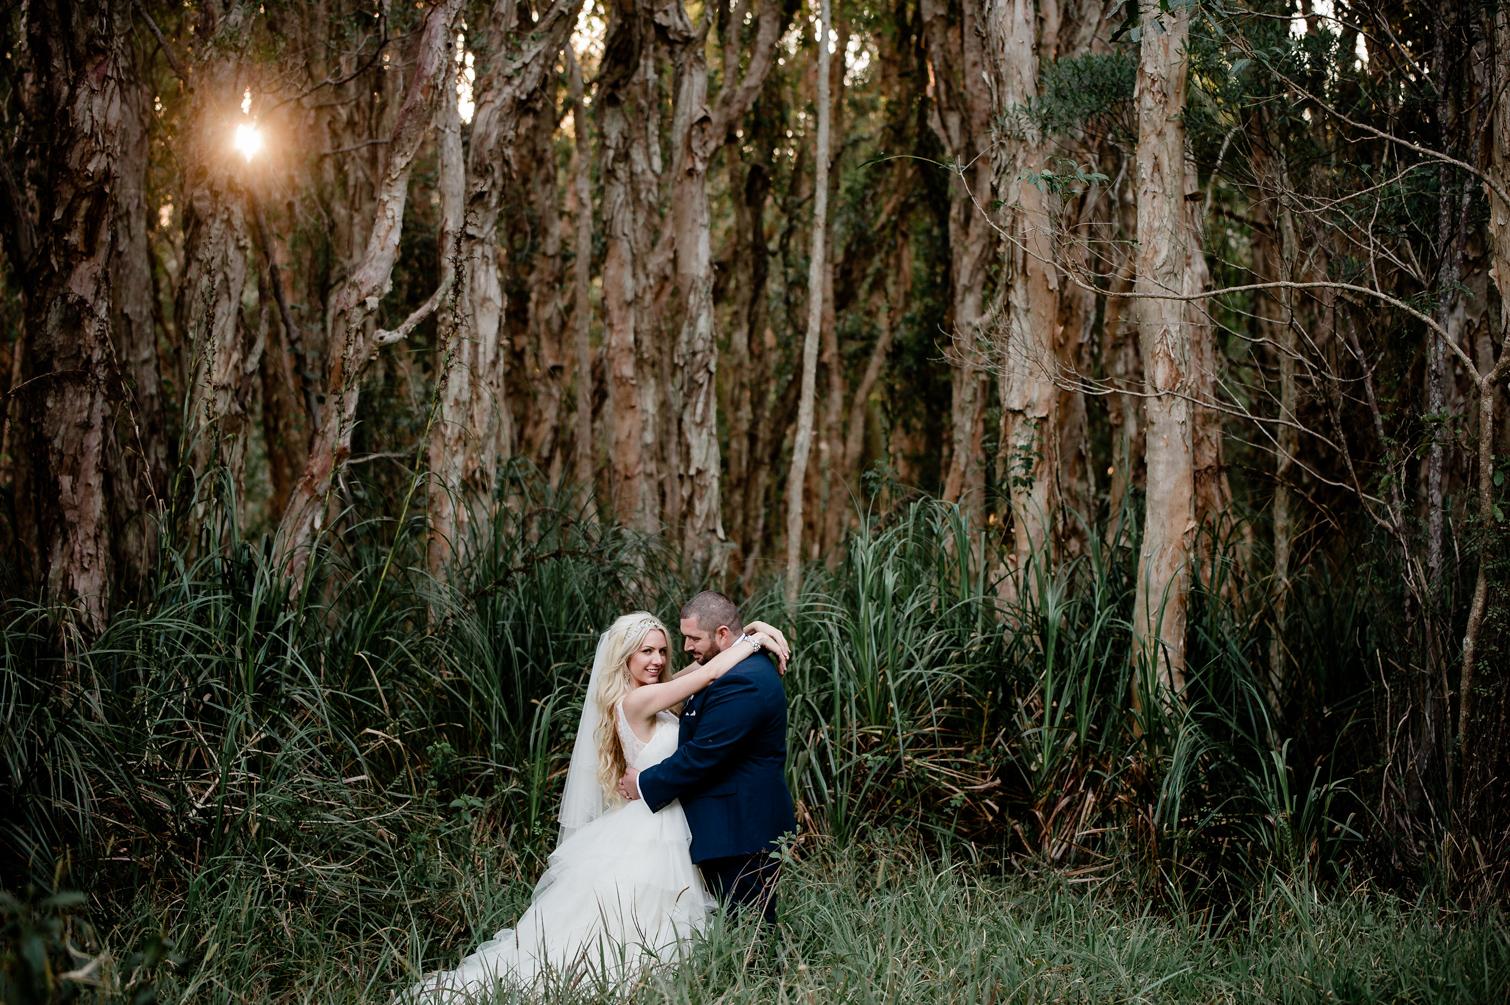 The_Belongil_Byron_Bay_Weddings_New_Black_Studios-144.jpg